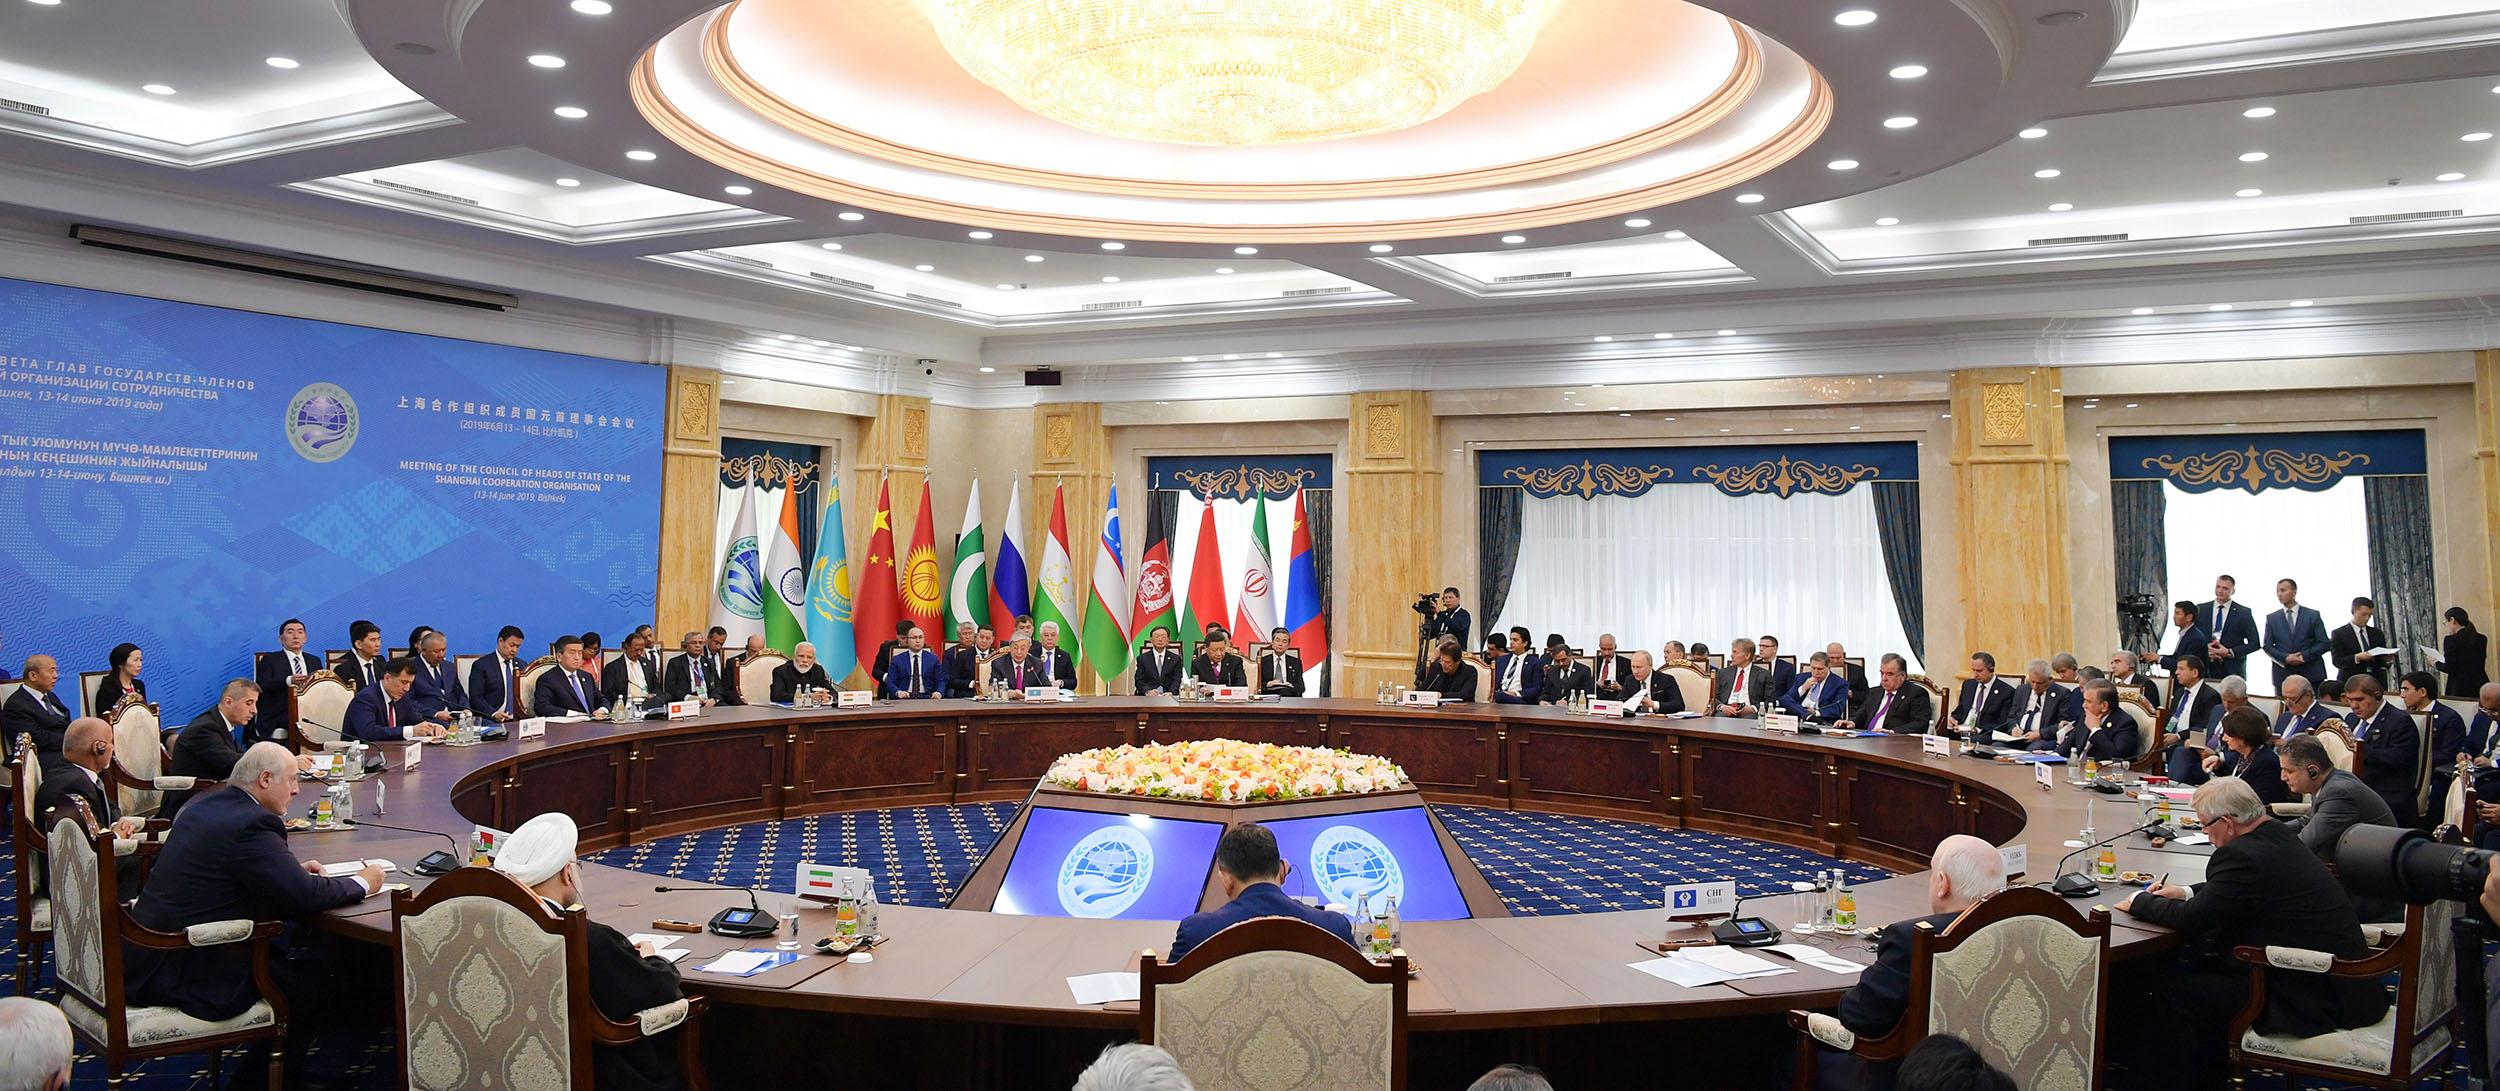 Итоги ШОС: Токаев нацелен на укрепление сотрудничества в сфере цифровизации